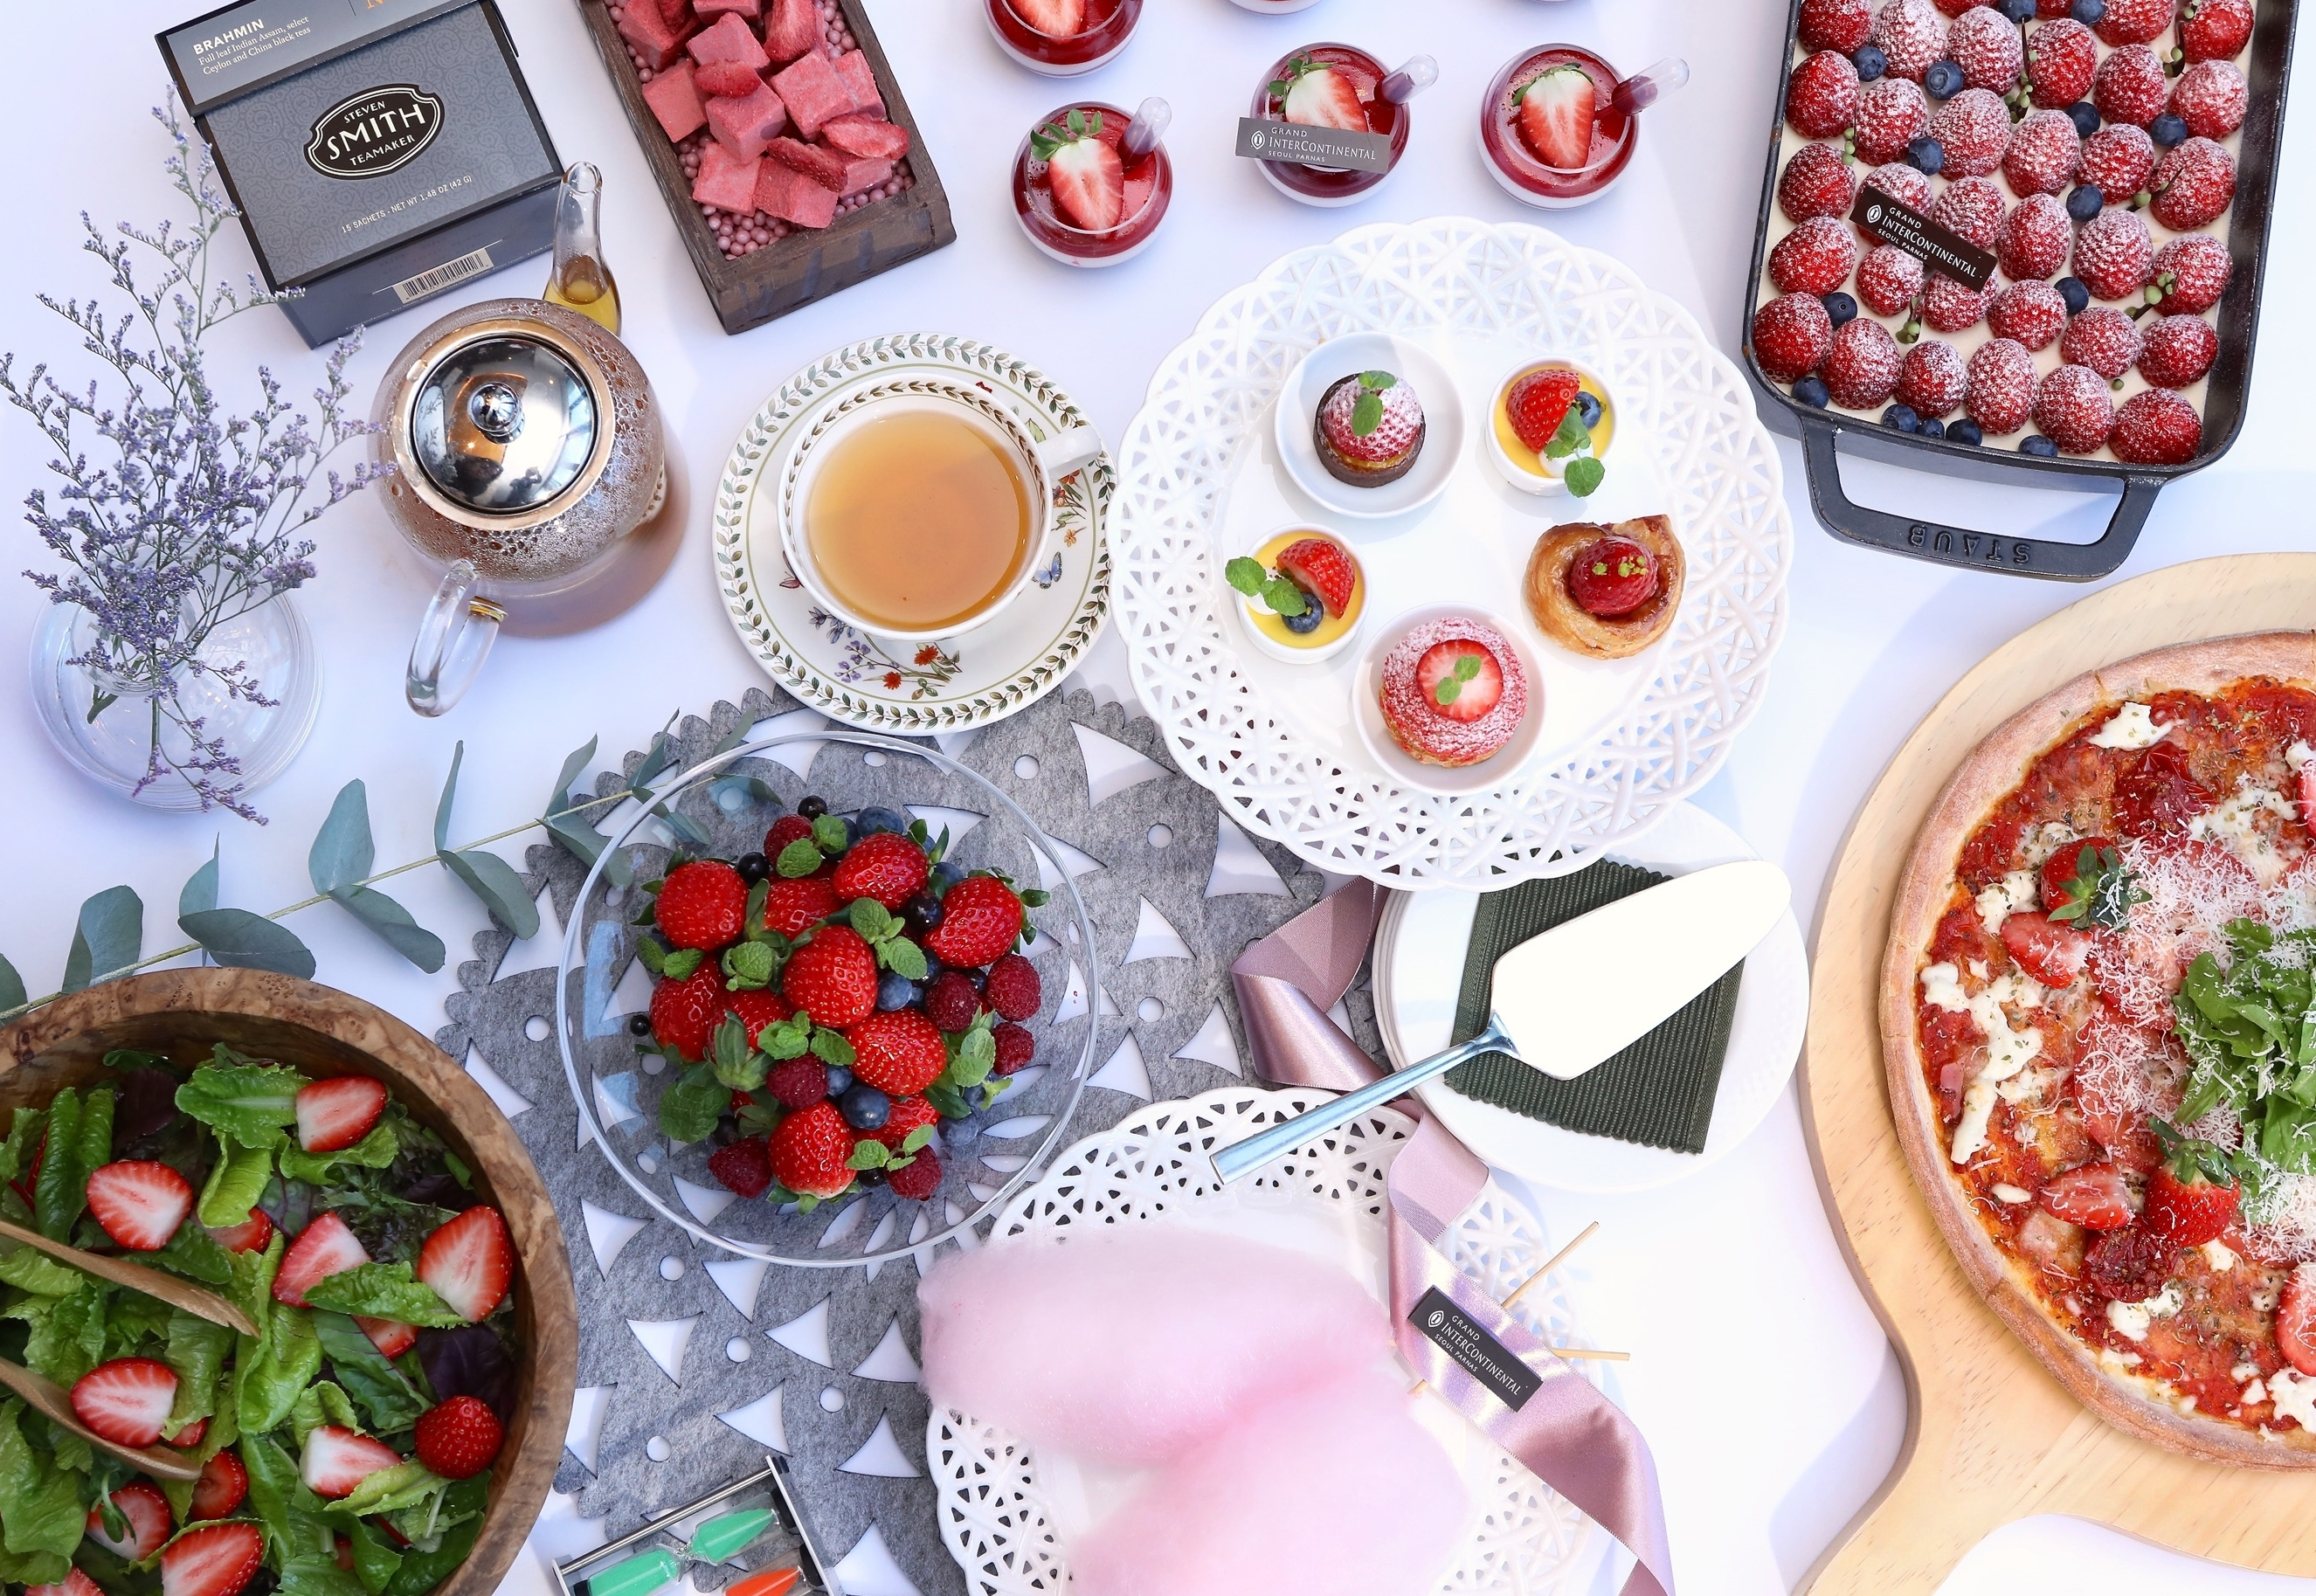 Strawberry desserts to indulge in